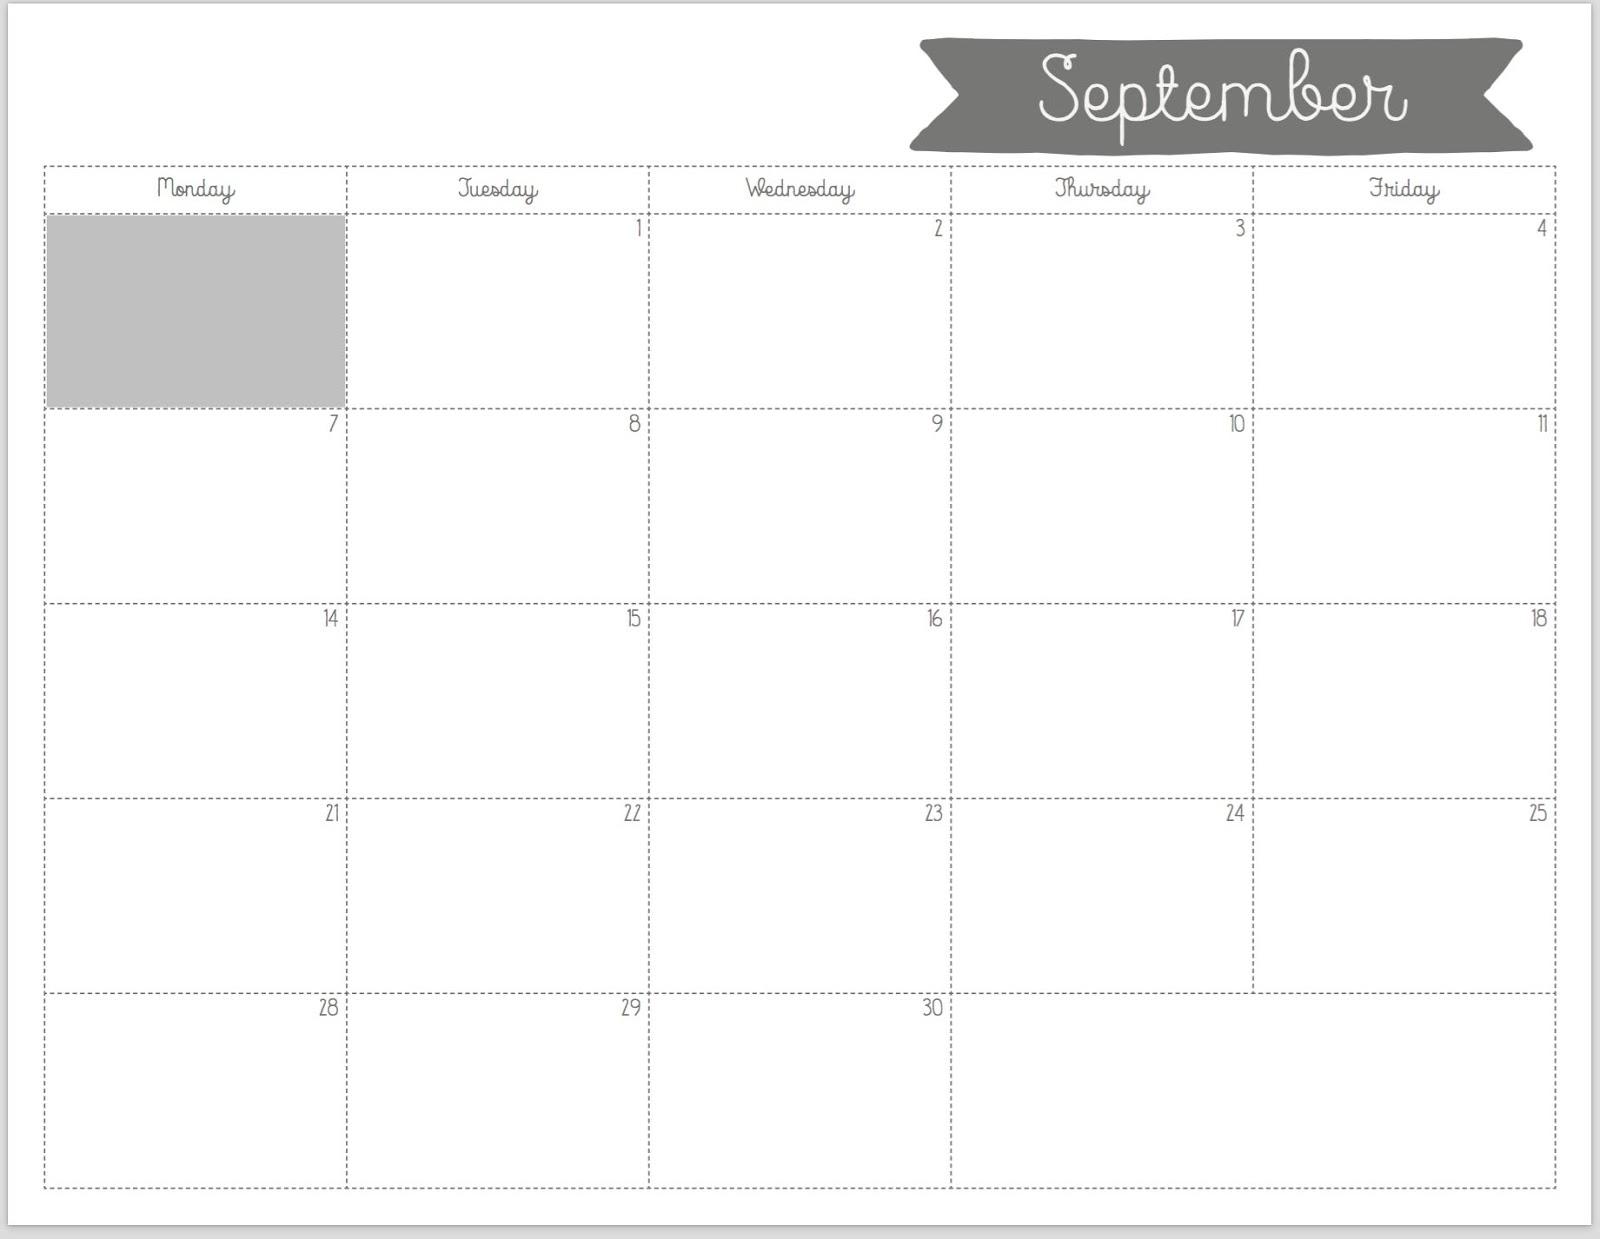 90 Day Calendar Template Excel | | 2018 january calendar